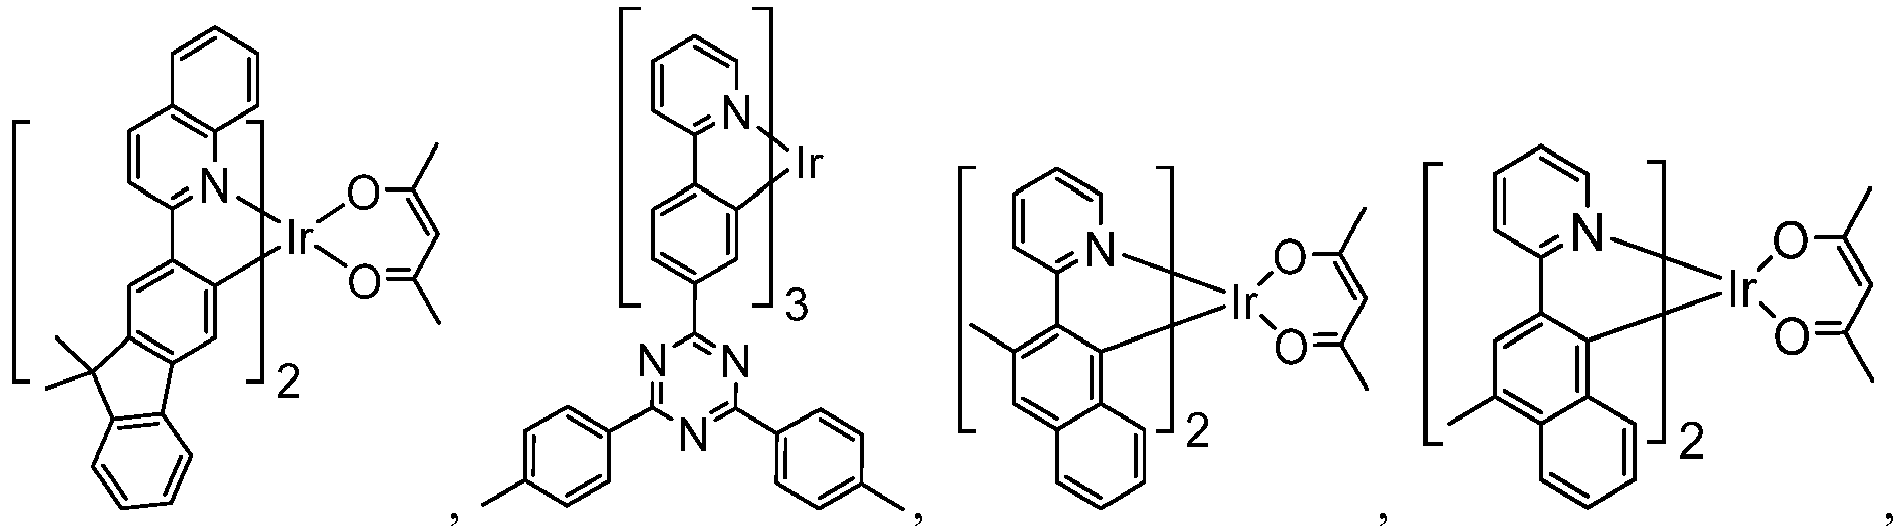 Figure imgb0926